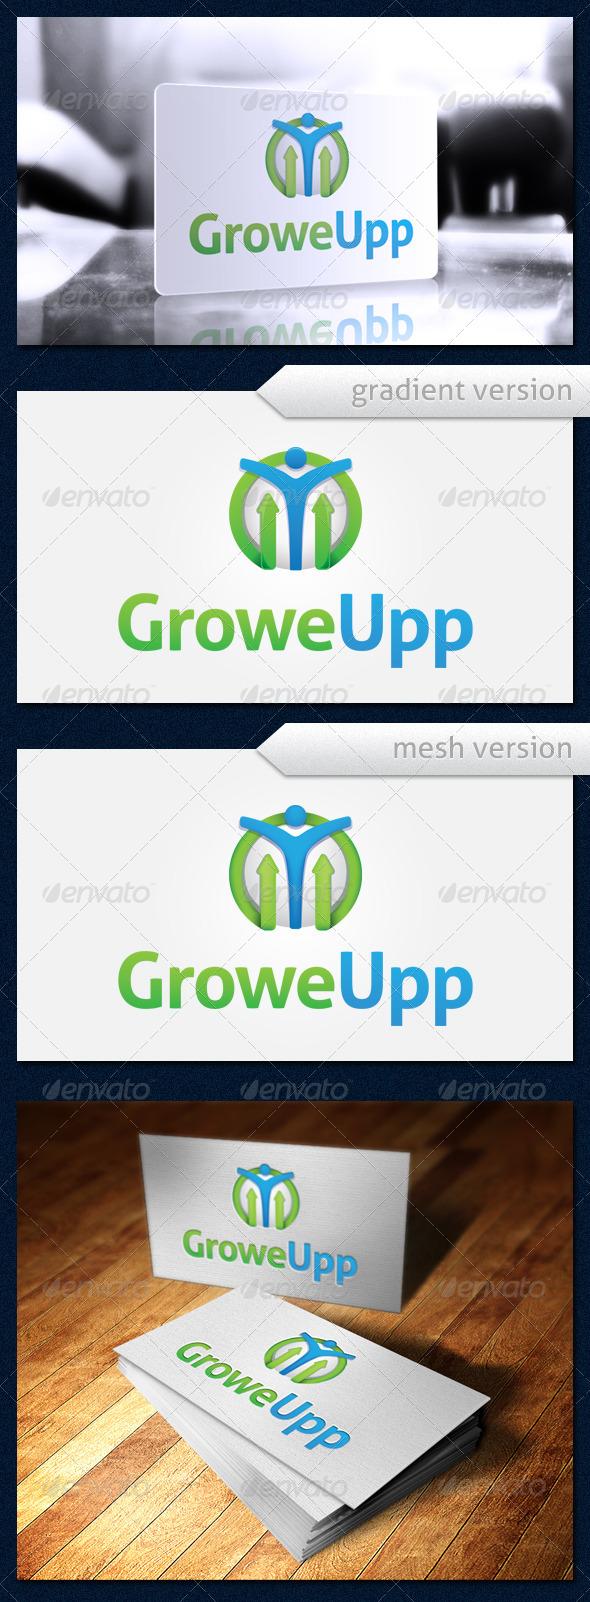 GroweUpp Logo